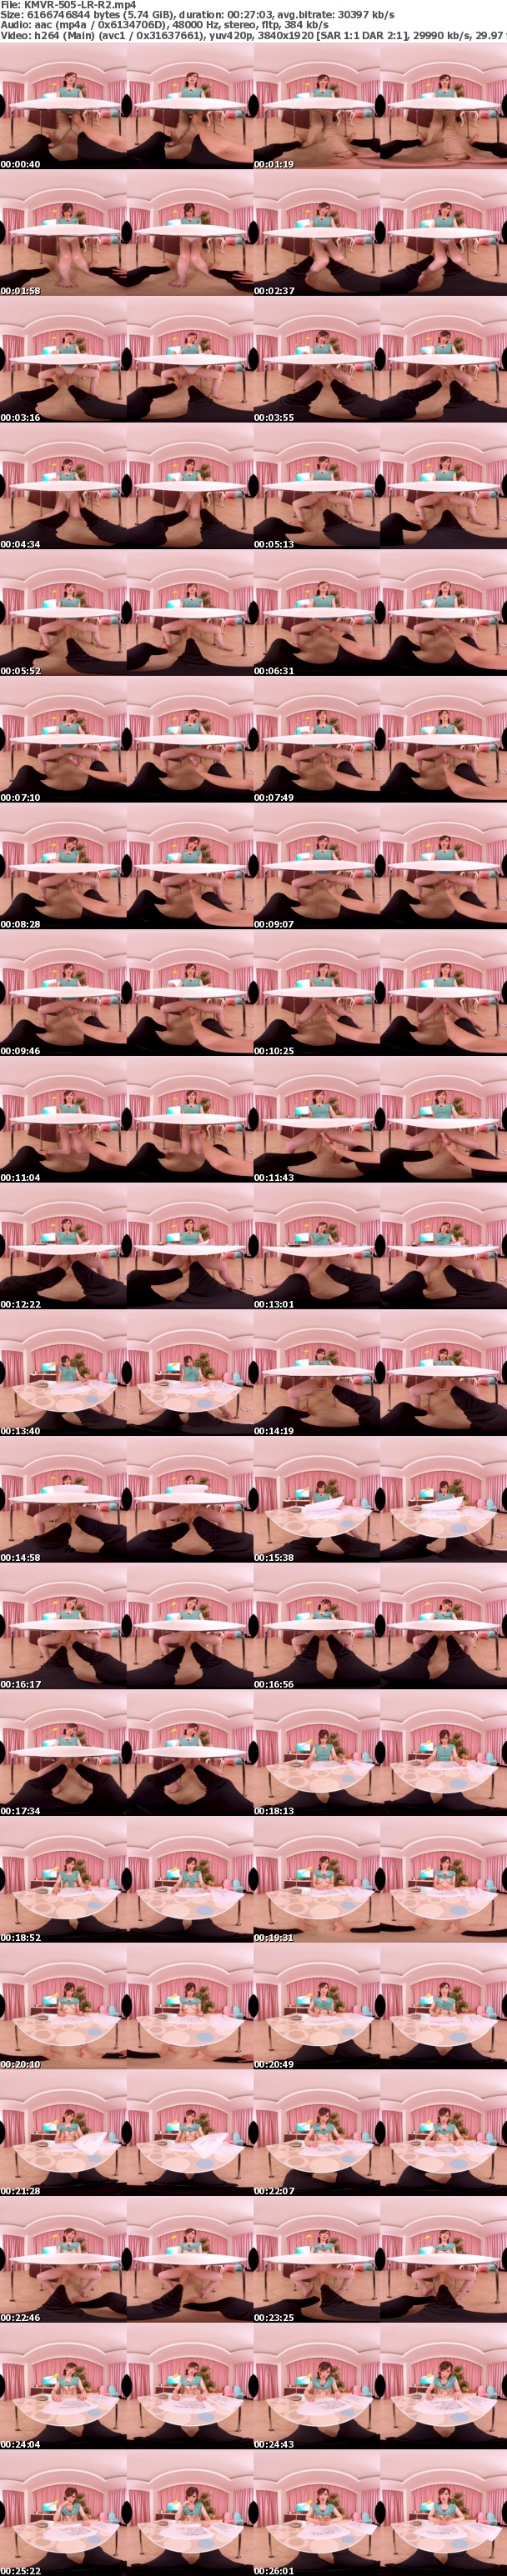 VR/3D KMVR-505 【超高画質版】女子アナ生本番生放送 皆瀬杏樹